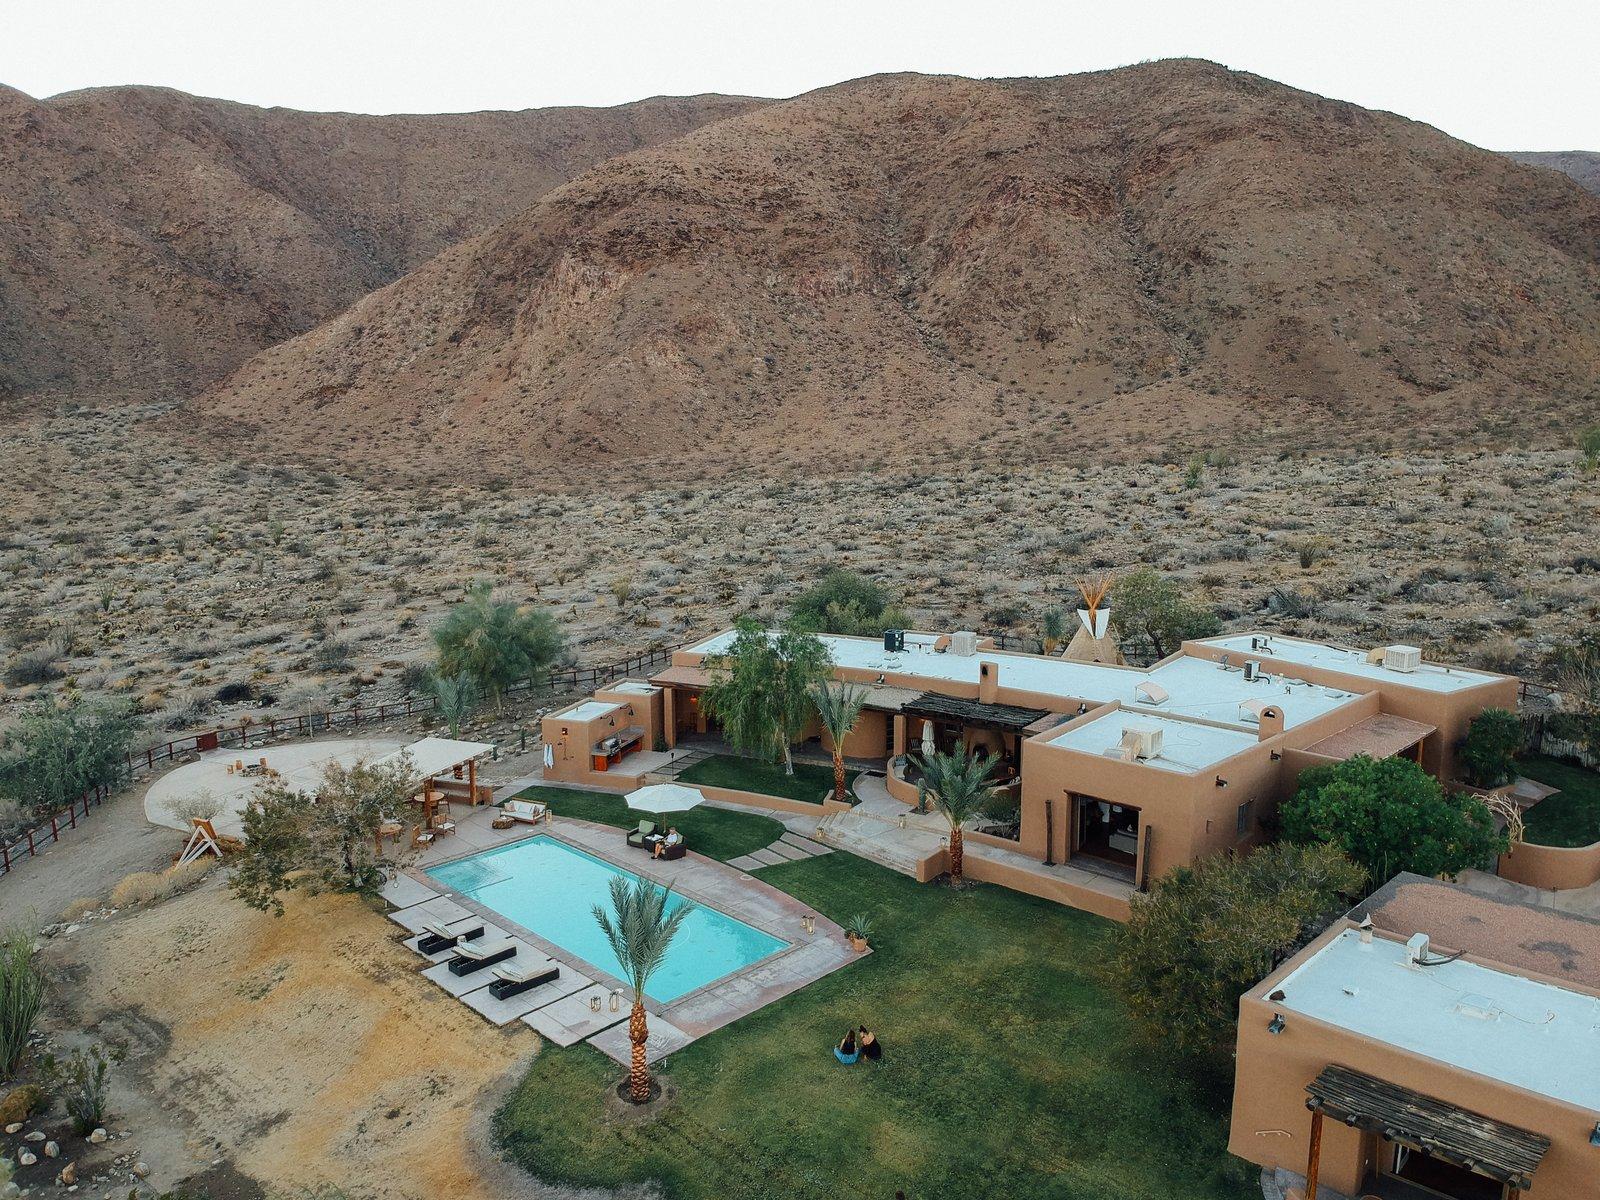 Melissa Young desert hacienda aerial view